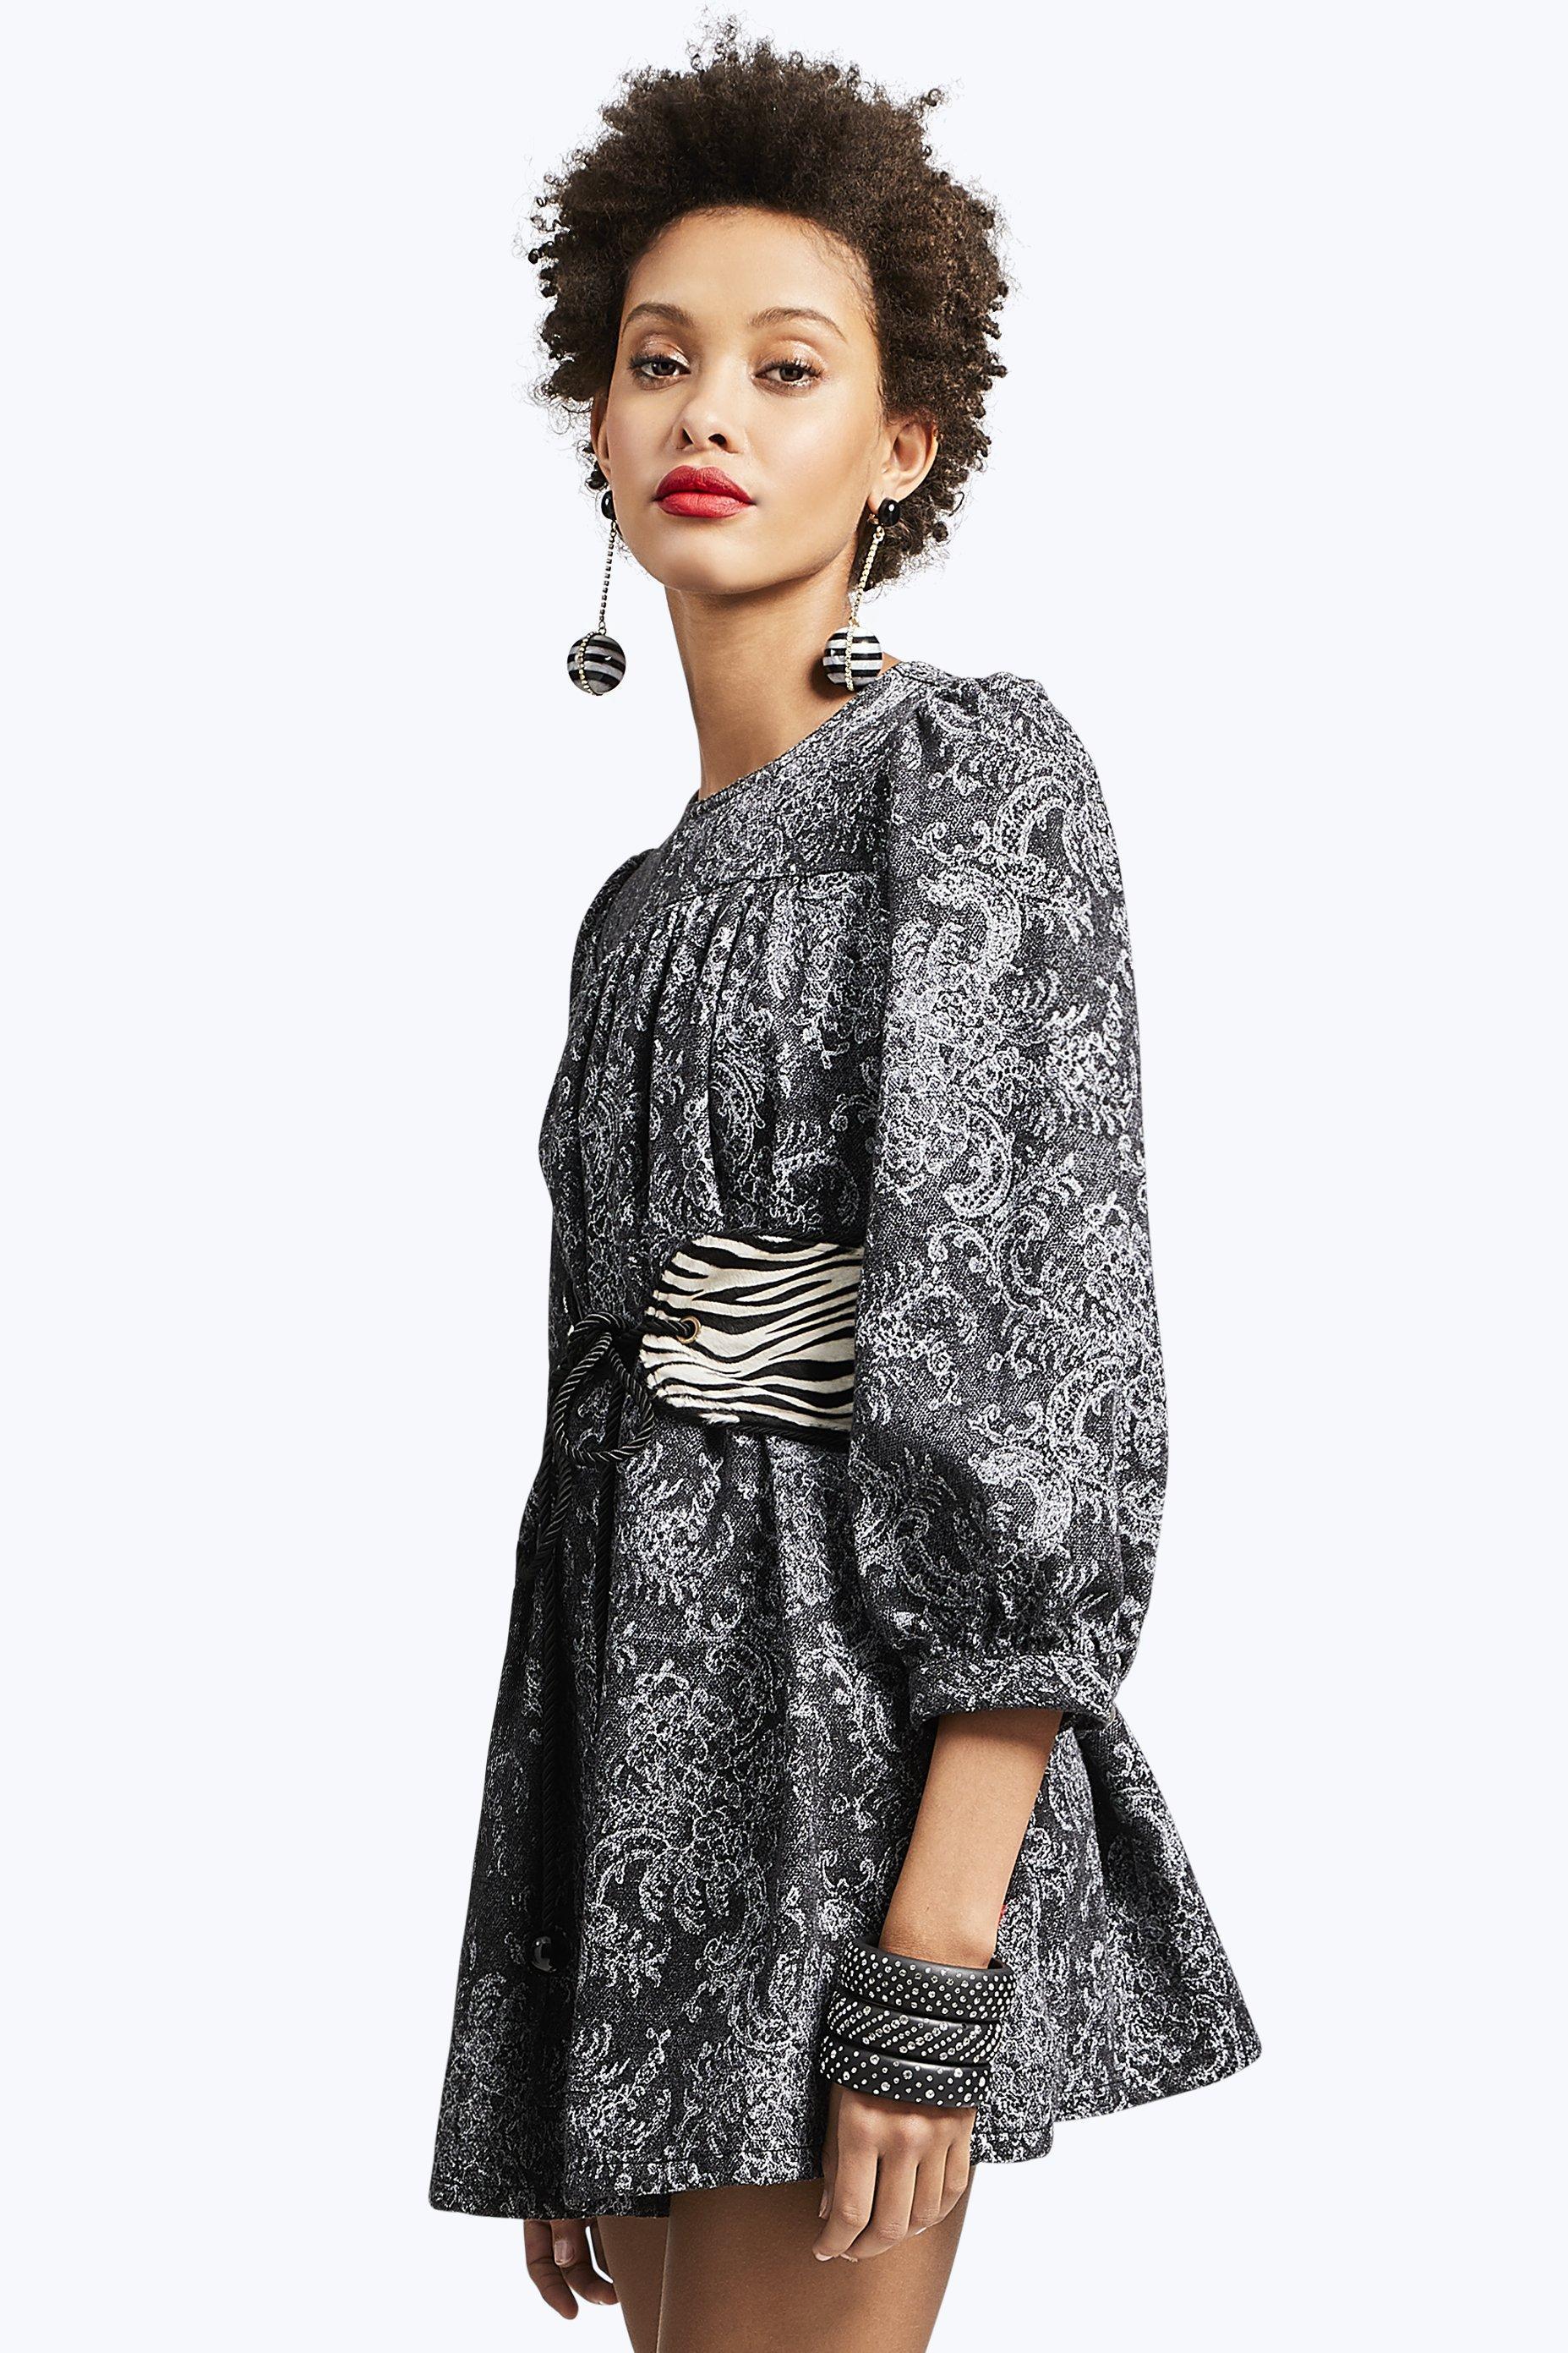 5c756b7b65ed Marc Jacobs Lace Printed Black Denim Babydoll Dress in Black - Lyst